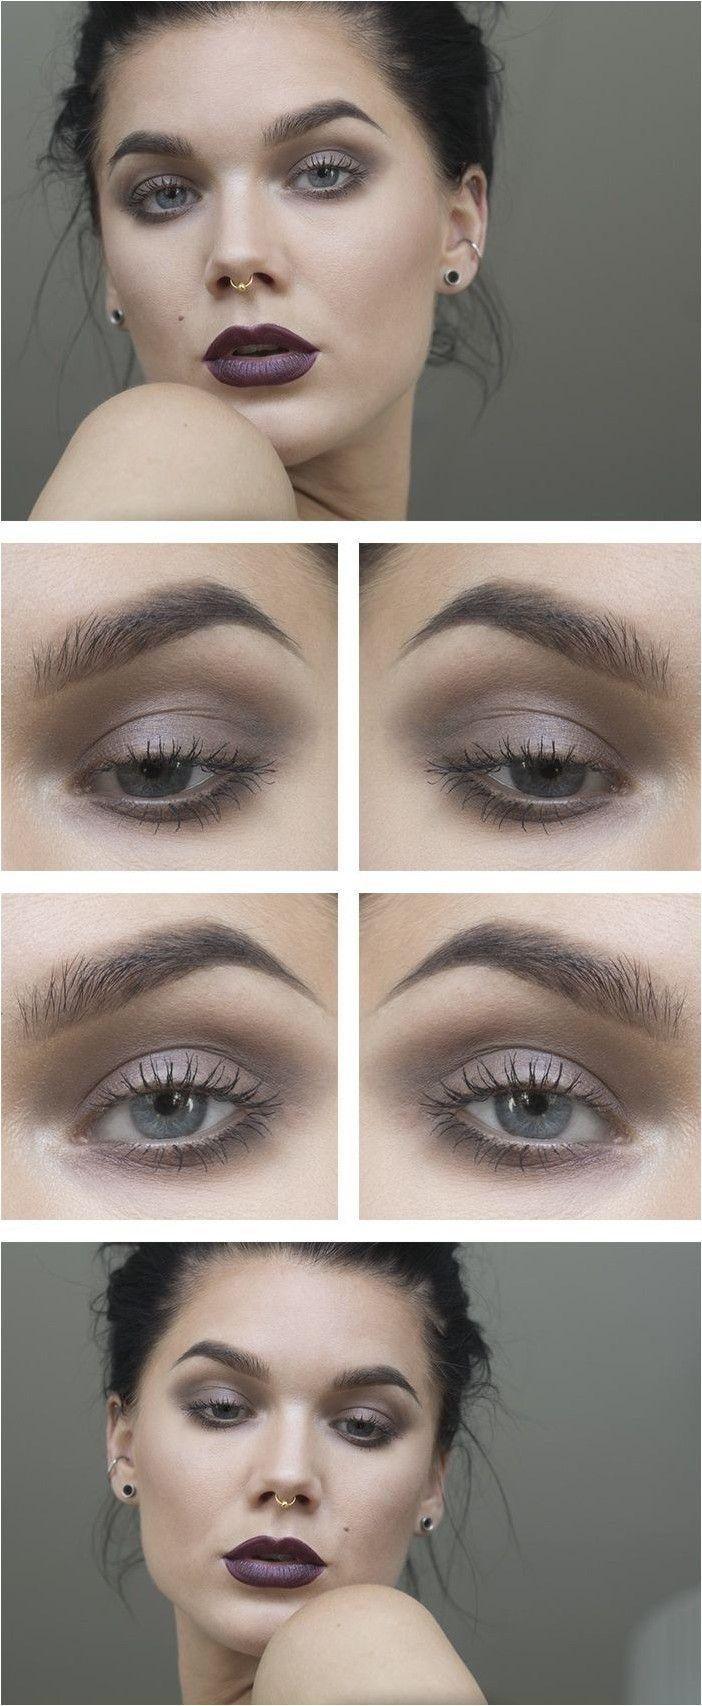 Makeup Tools. Increase elegance towards dramatic newfound